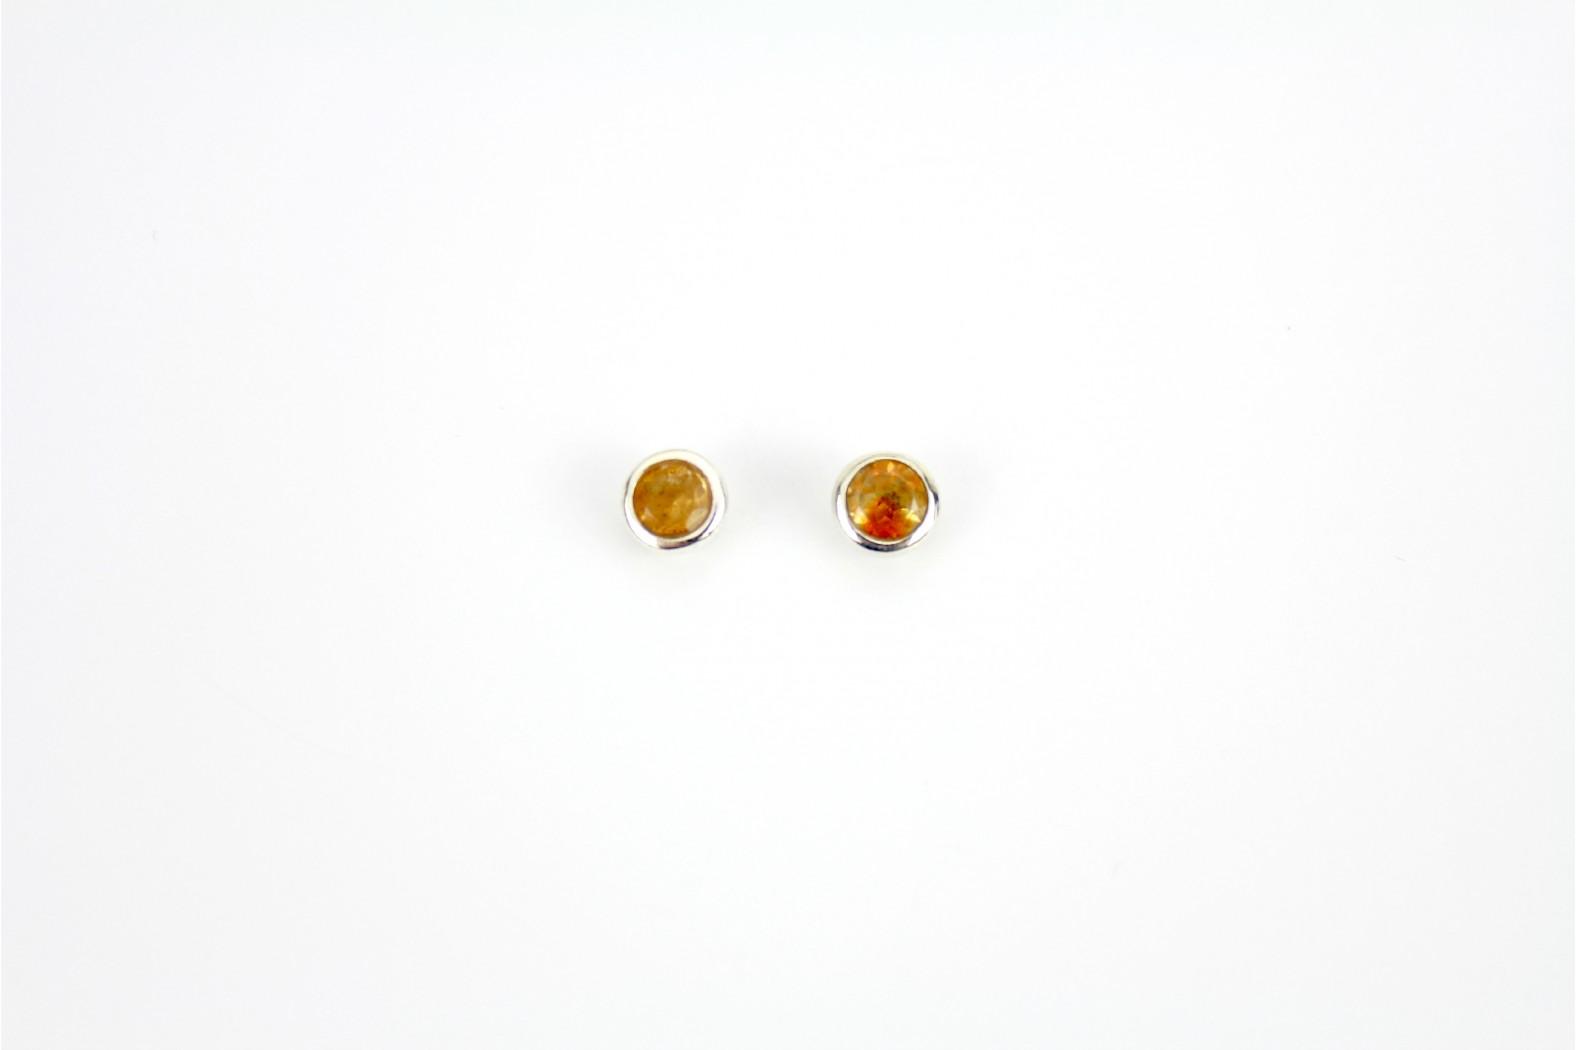 Circular Dark Citrine stud earrings set in circular silver mounting